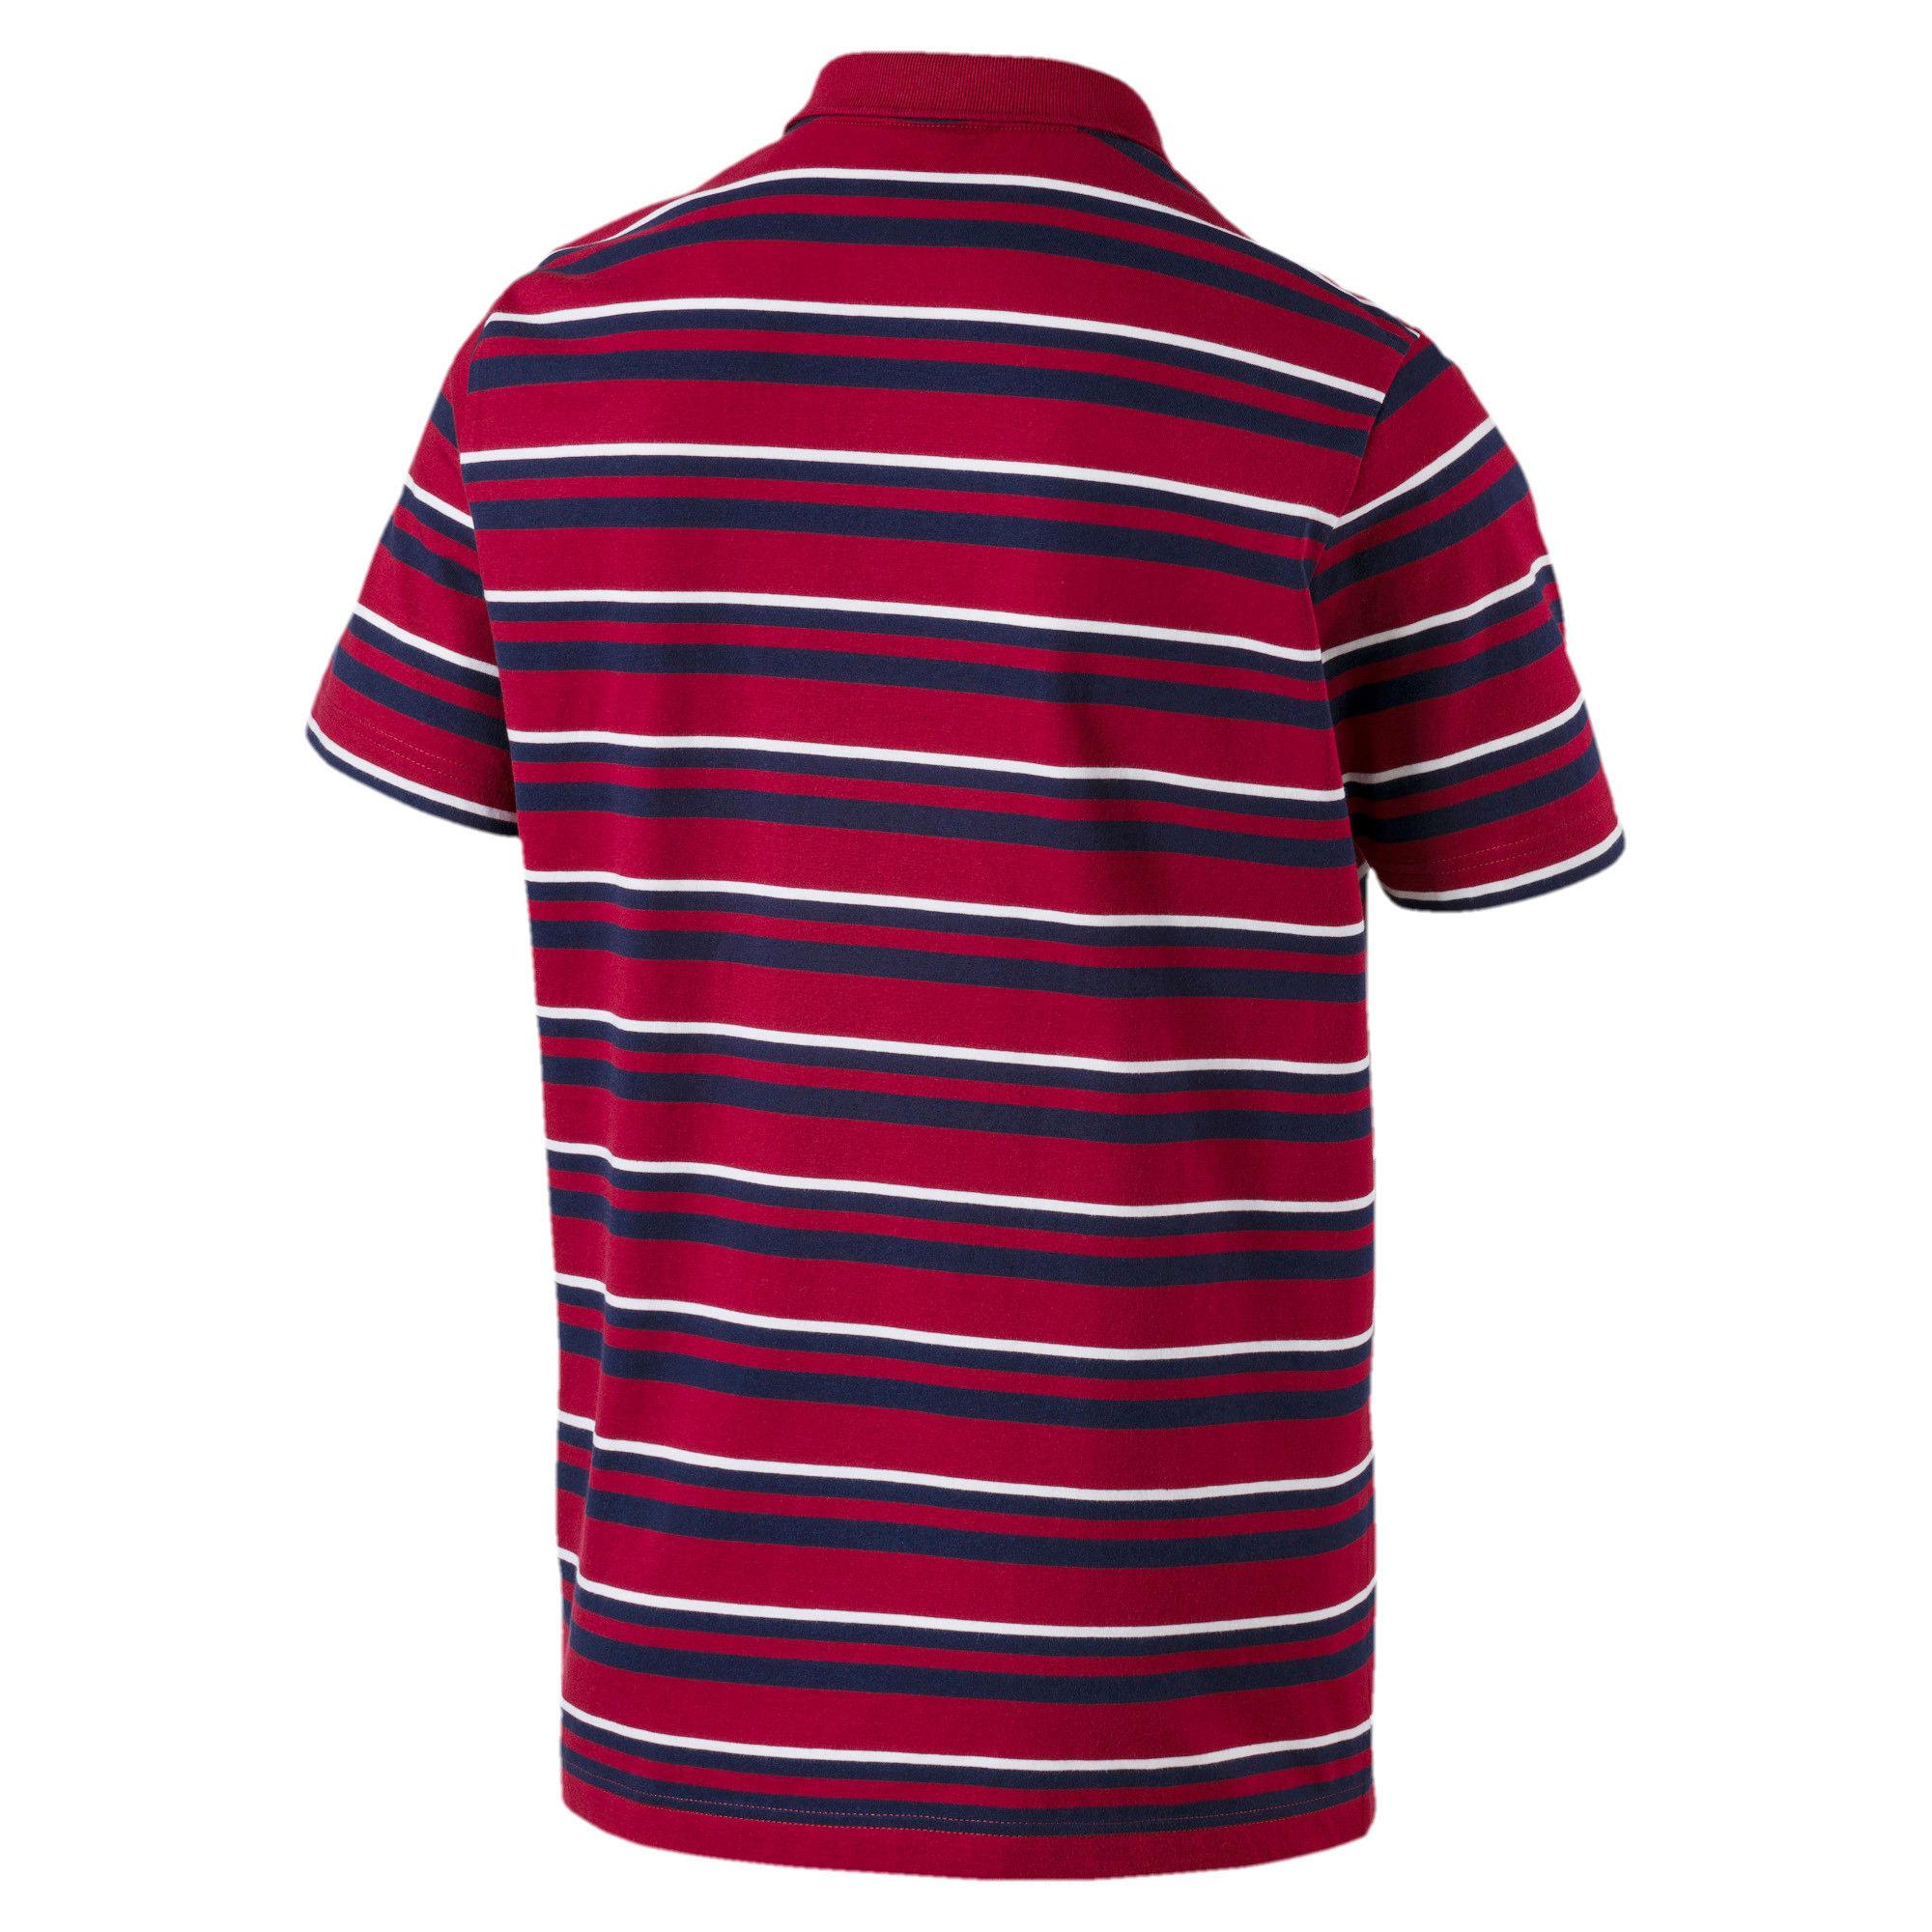 Thumbnail 5 of ESS+ Striped J Men's Polo, Rhubarb, medium